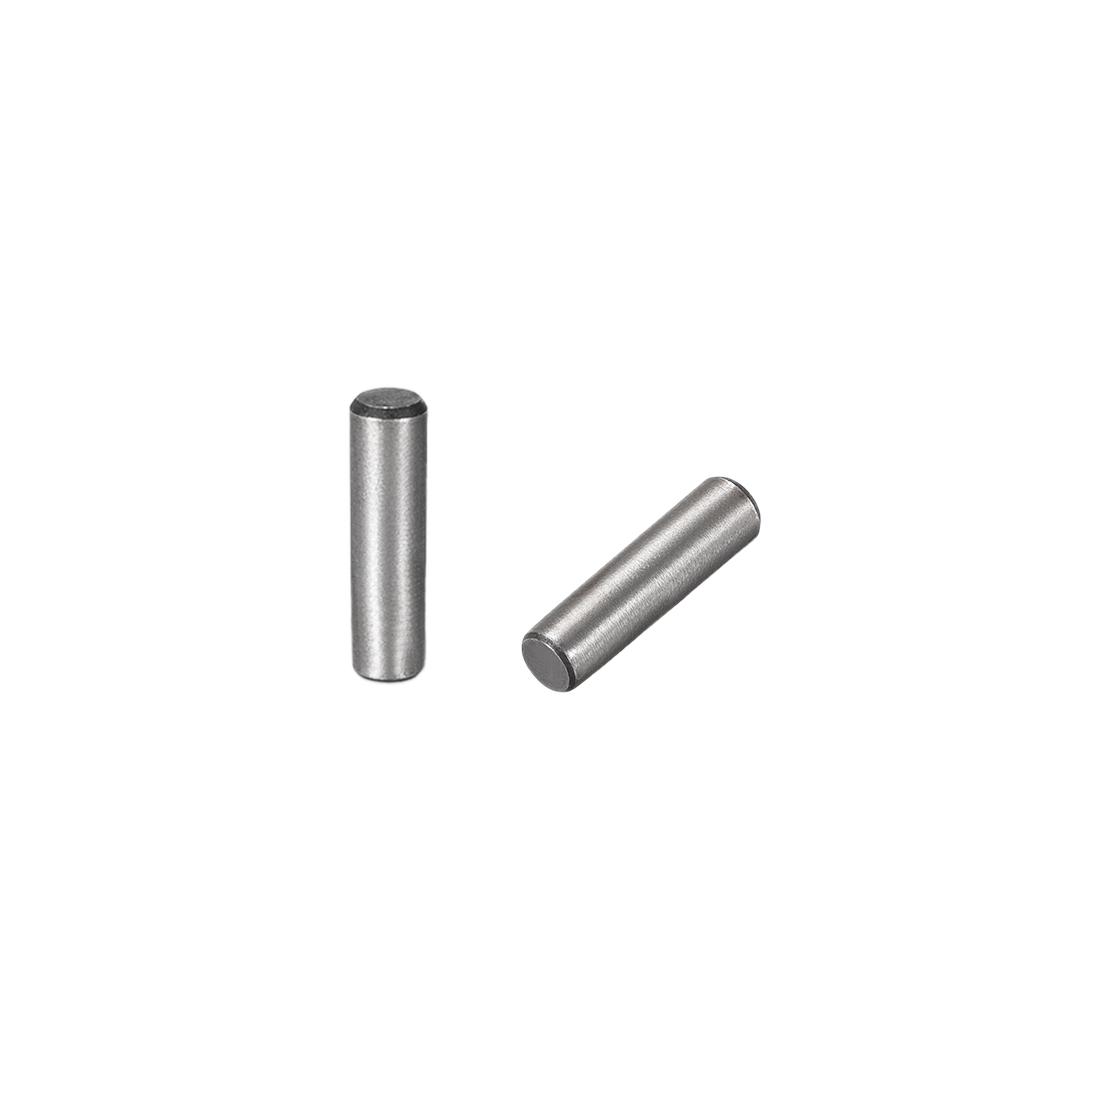 Carbon Steel GB117 20mm Length 5mmx5.4mm Small End Diameter 1:50 Taper Pin 5Pcs